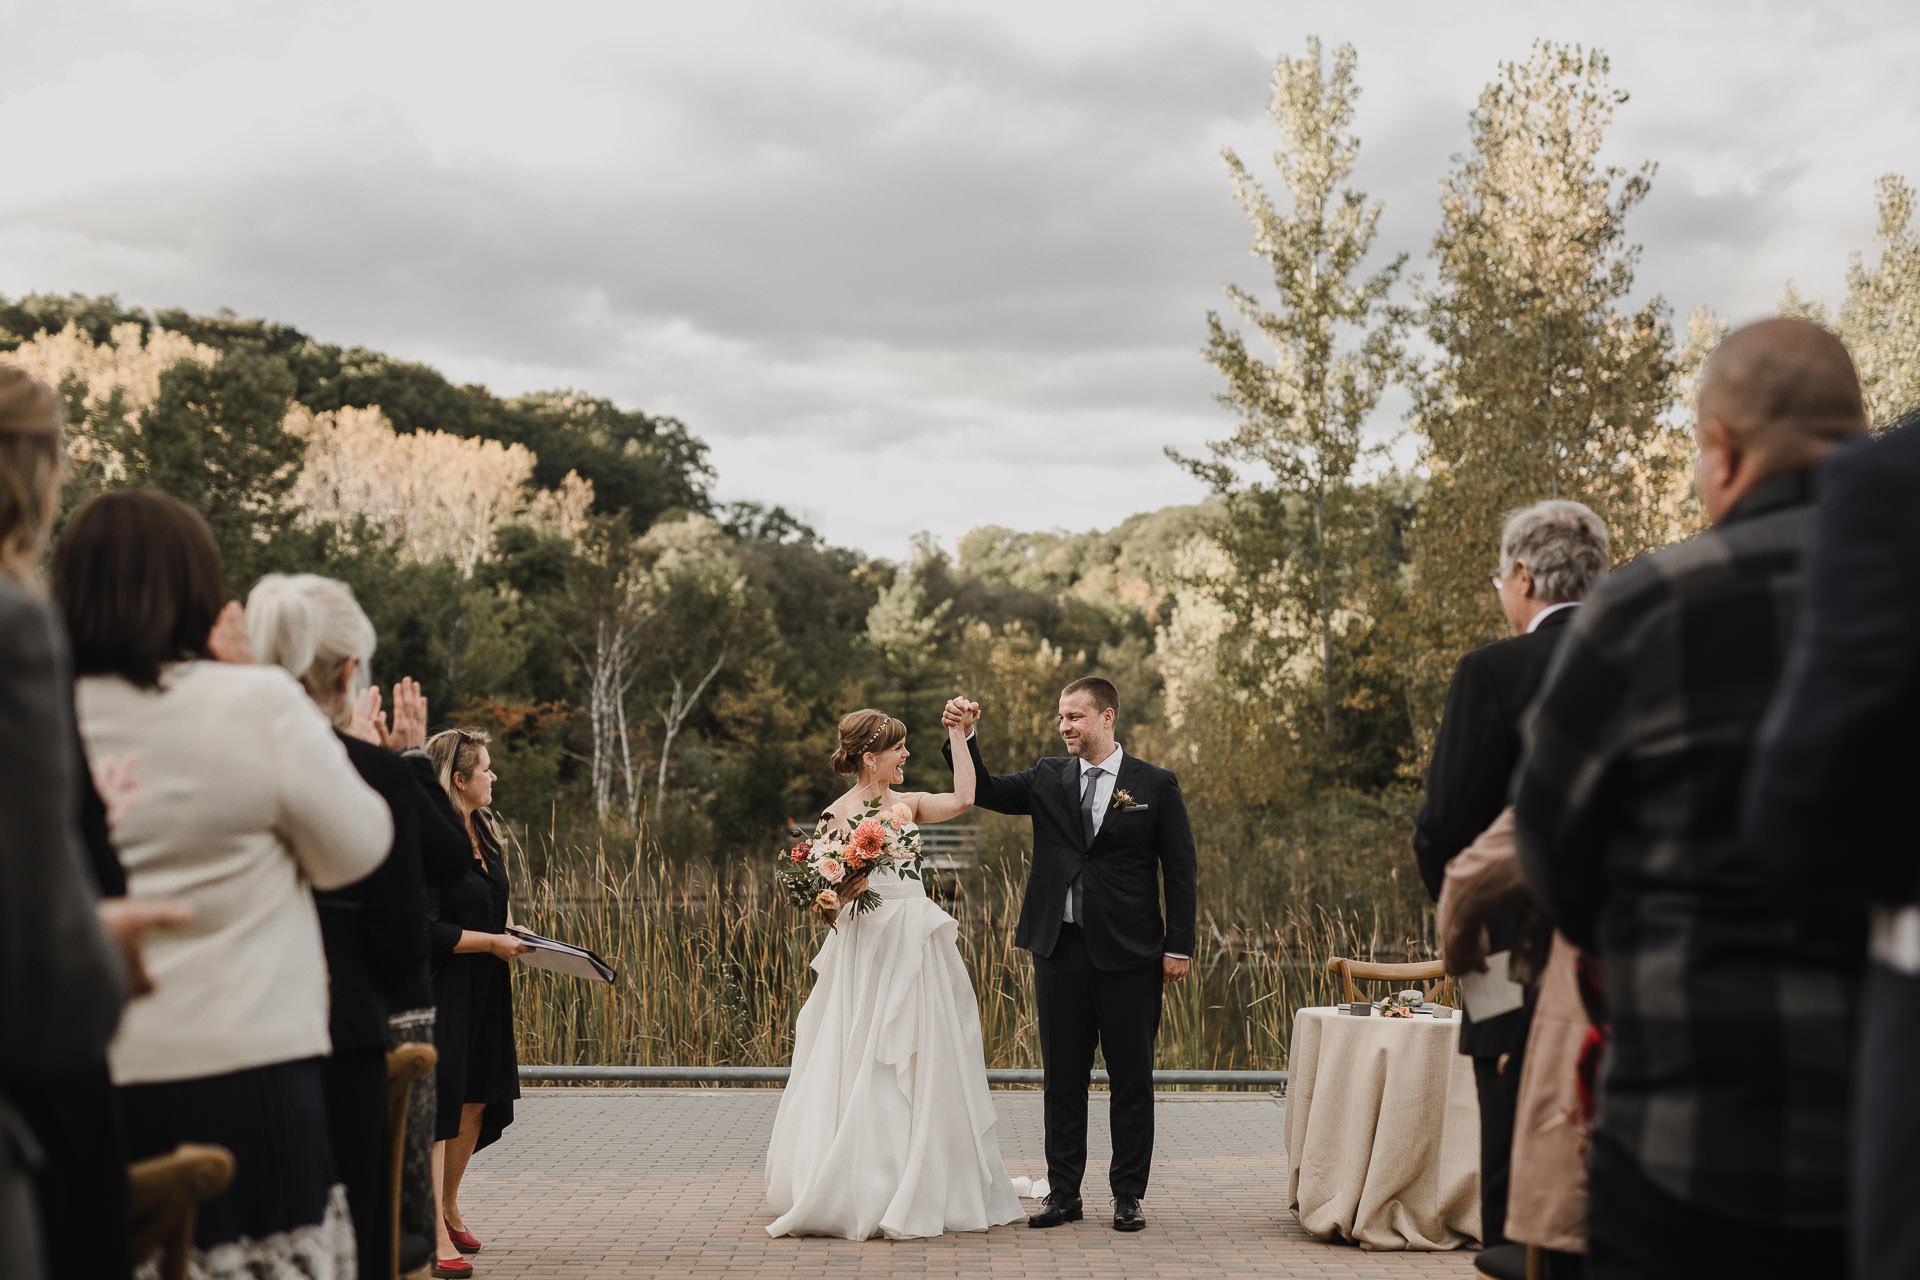 Evergreen Brickworks wedding photographer - bride and groom celebrate